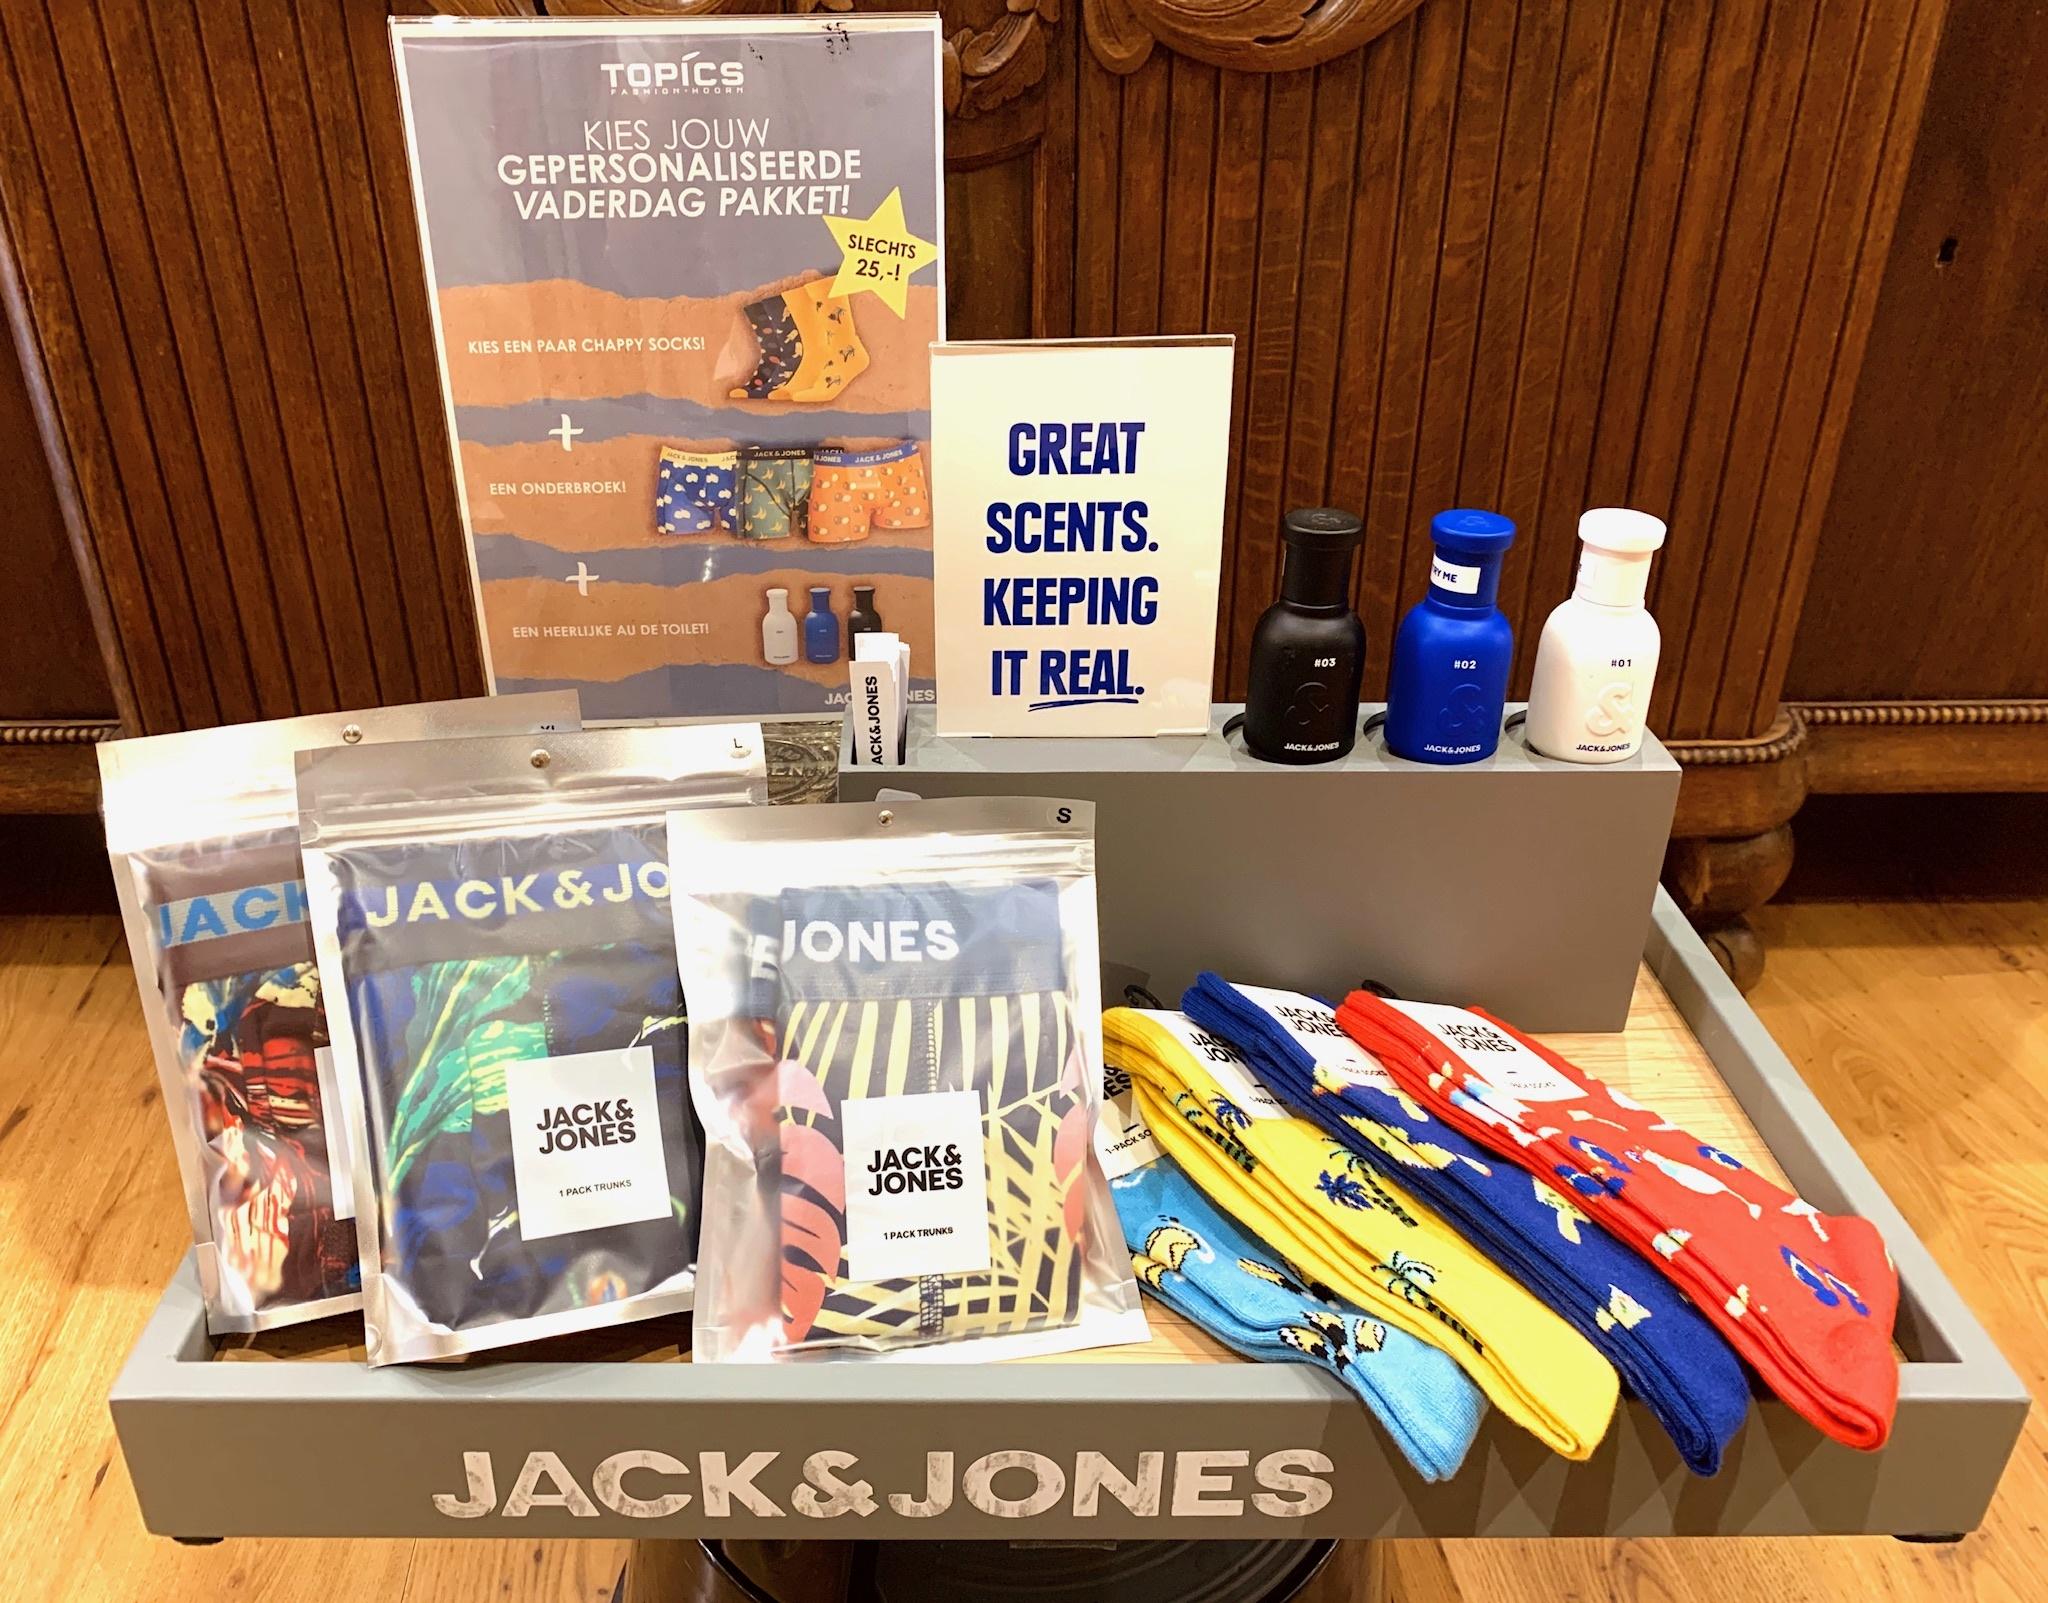 Vaderdagpakket-vaderdagactie-jack&jones